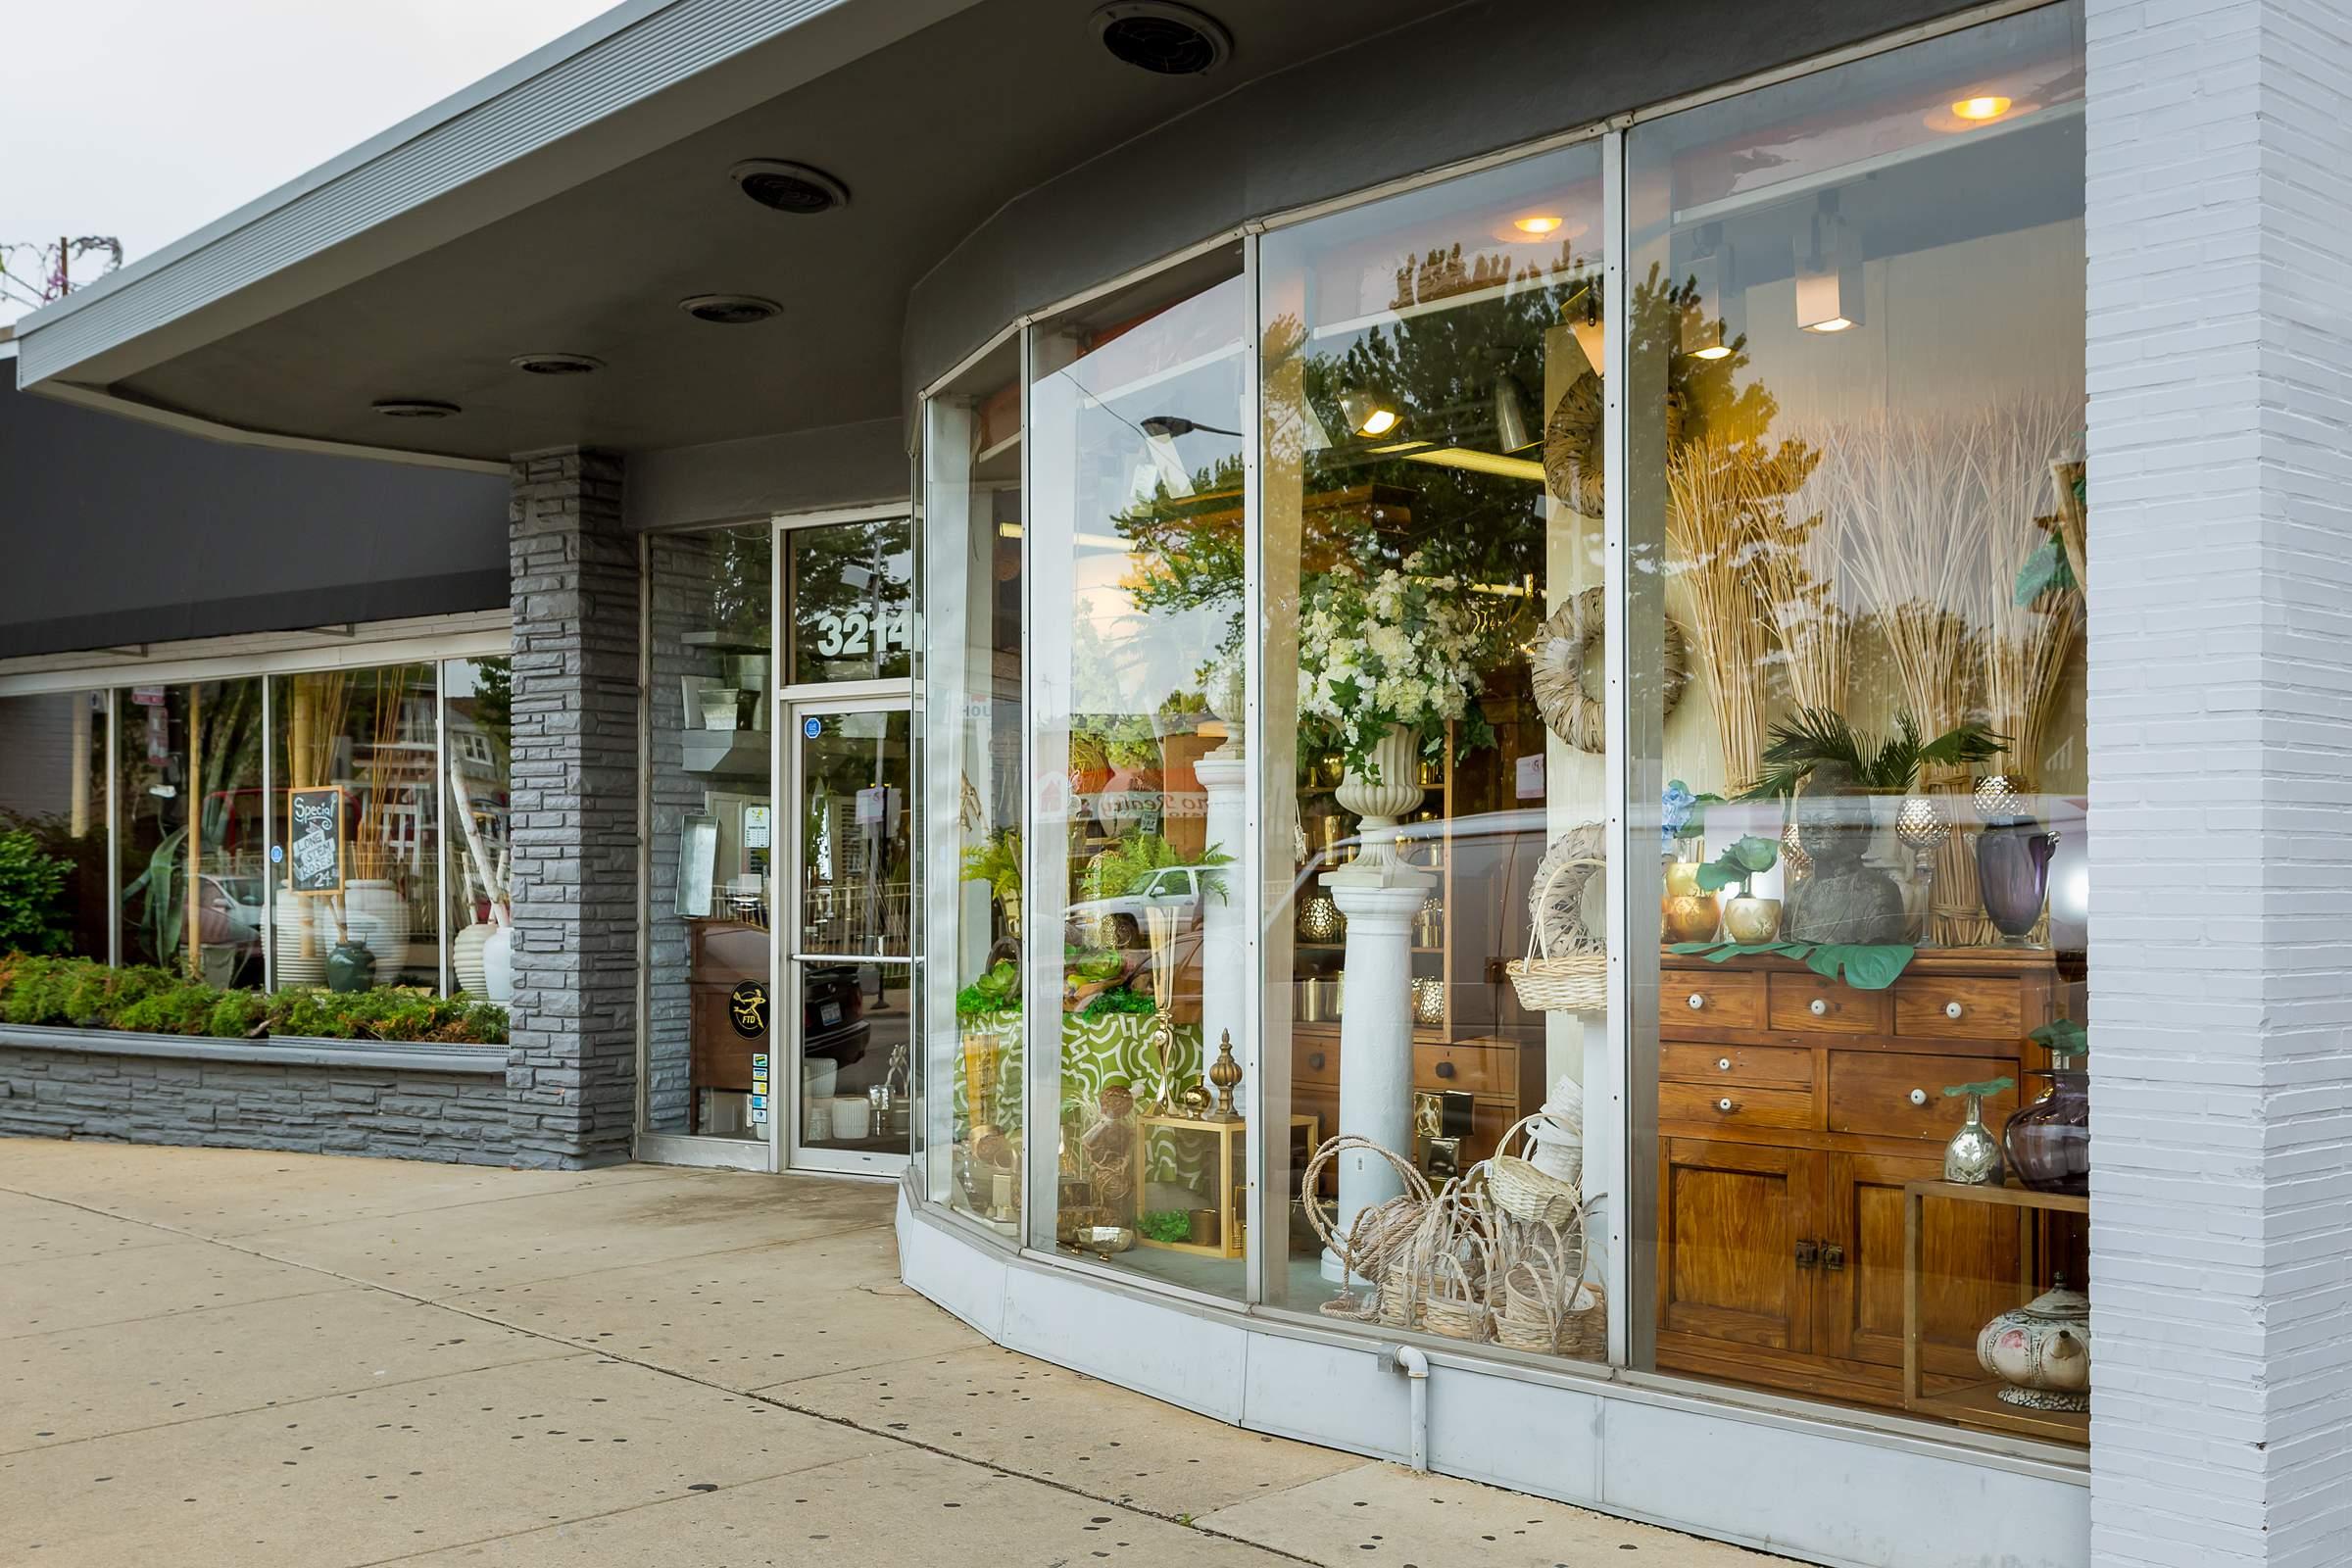 Boutiques In Chicago >> Kloeckner Flower Shop Chicago - Boutique Interior Google 360 Virtual Photography | WalkThru360 ...